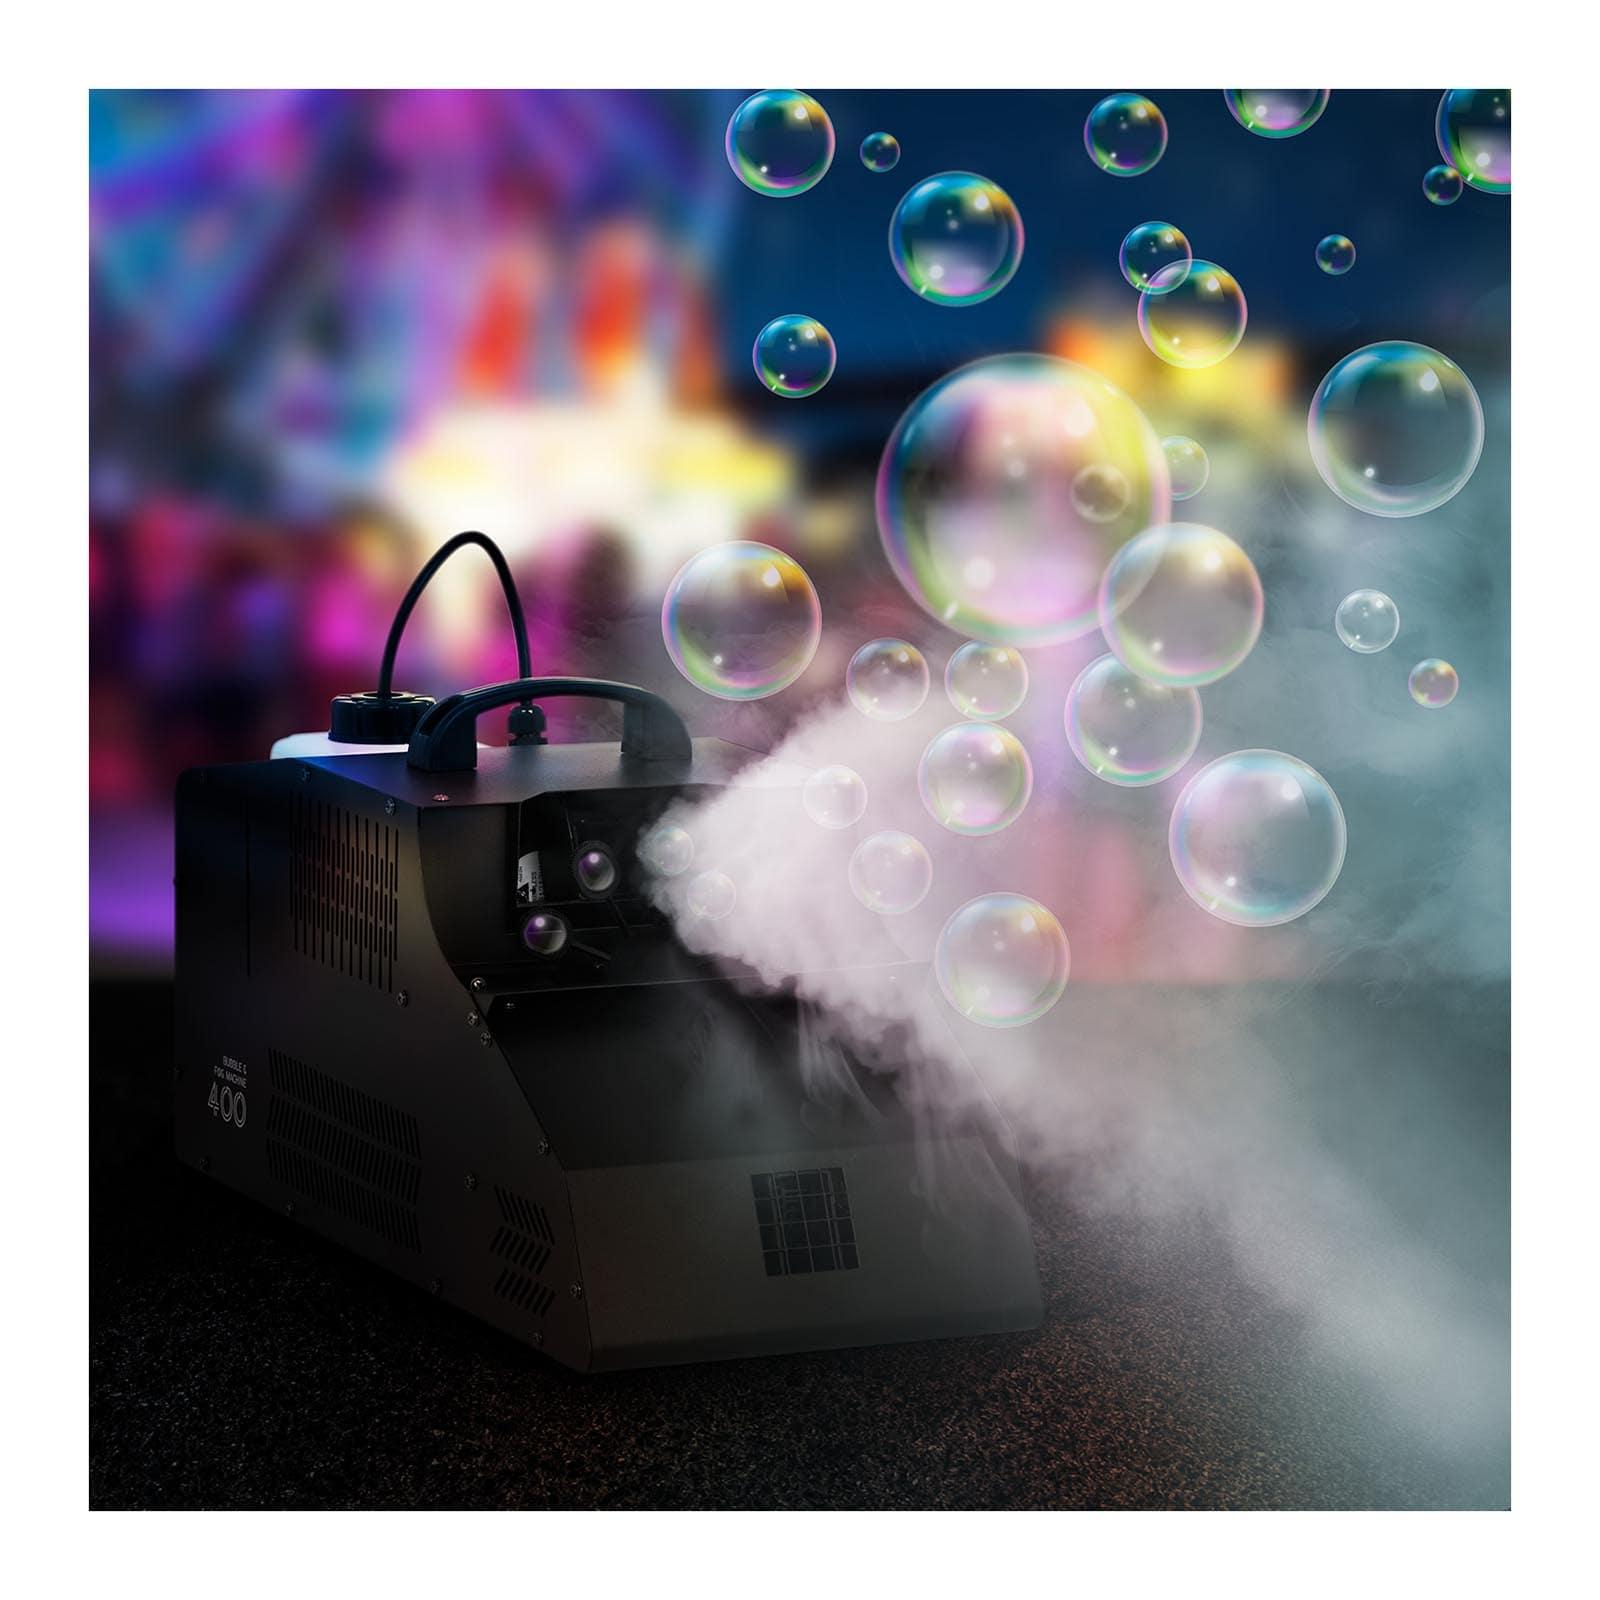 Dūmu un burbuļu mašīna